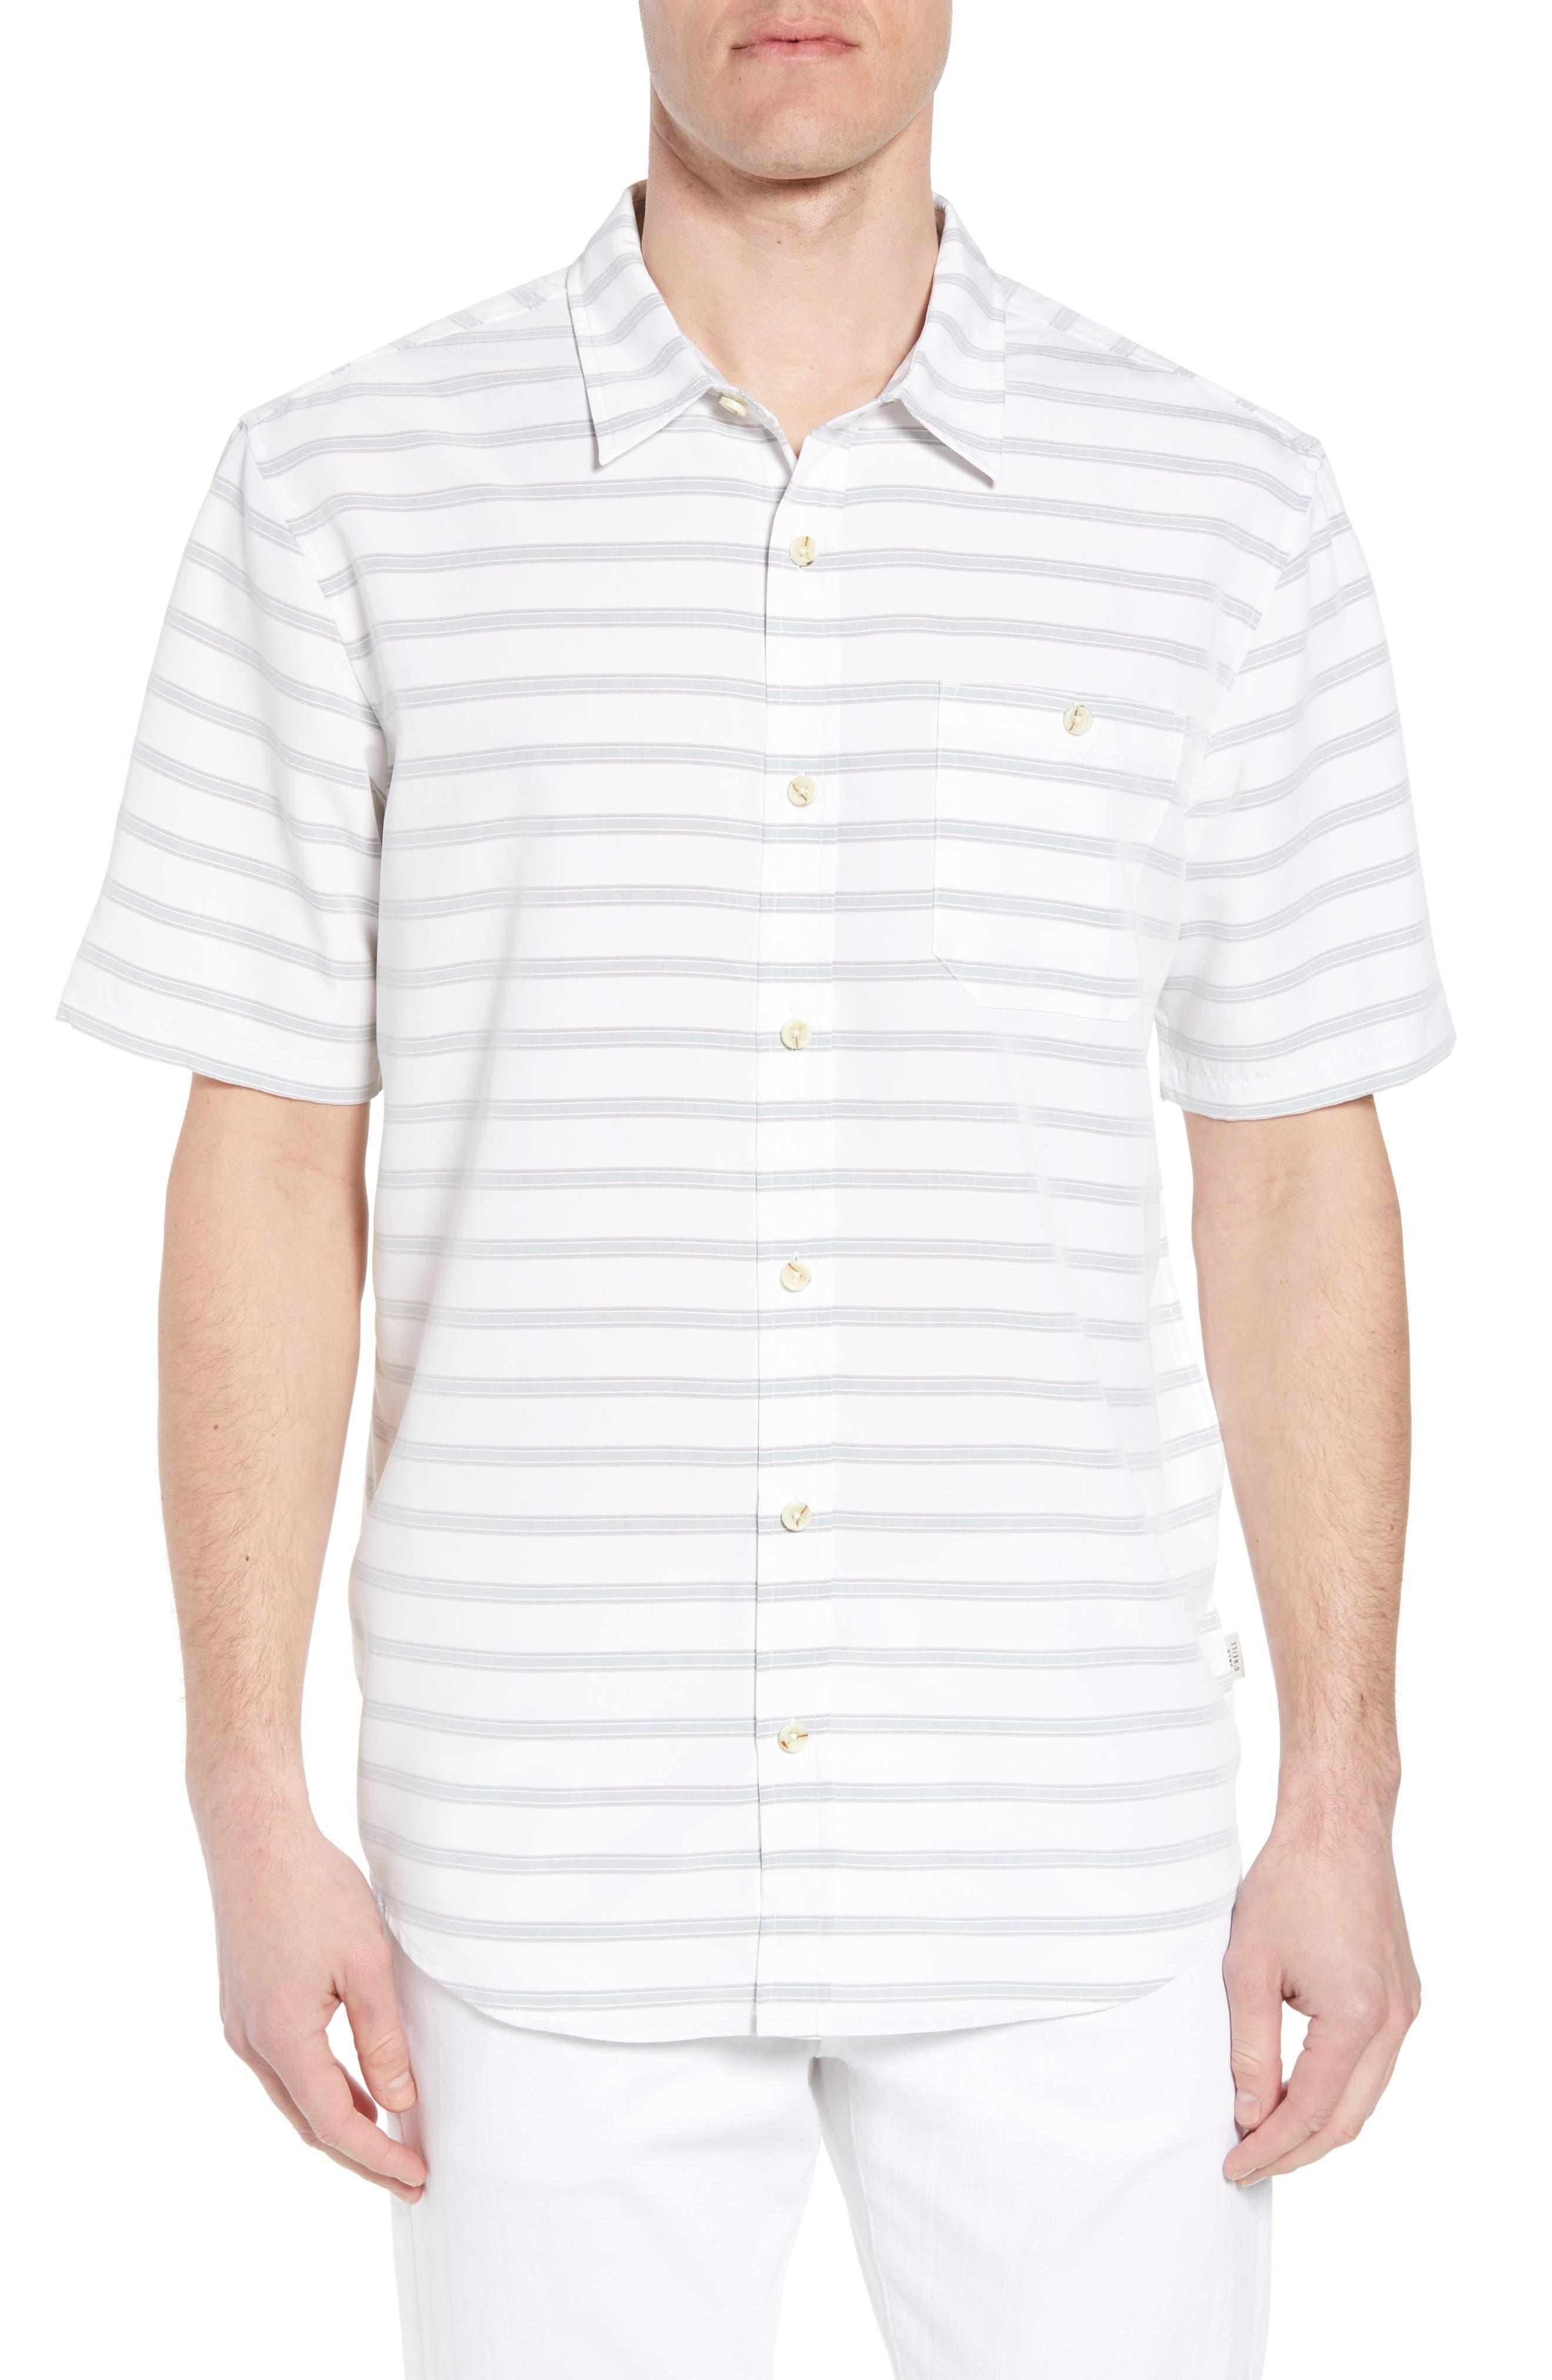 Slow Ride Sport Shirt,                             Main thumbnail 1, color,                             White